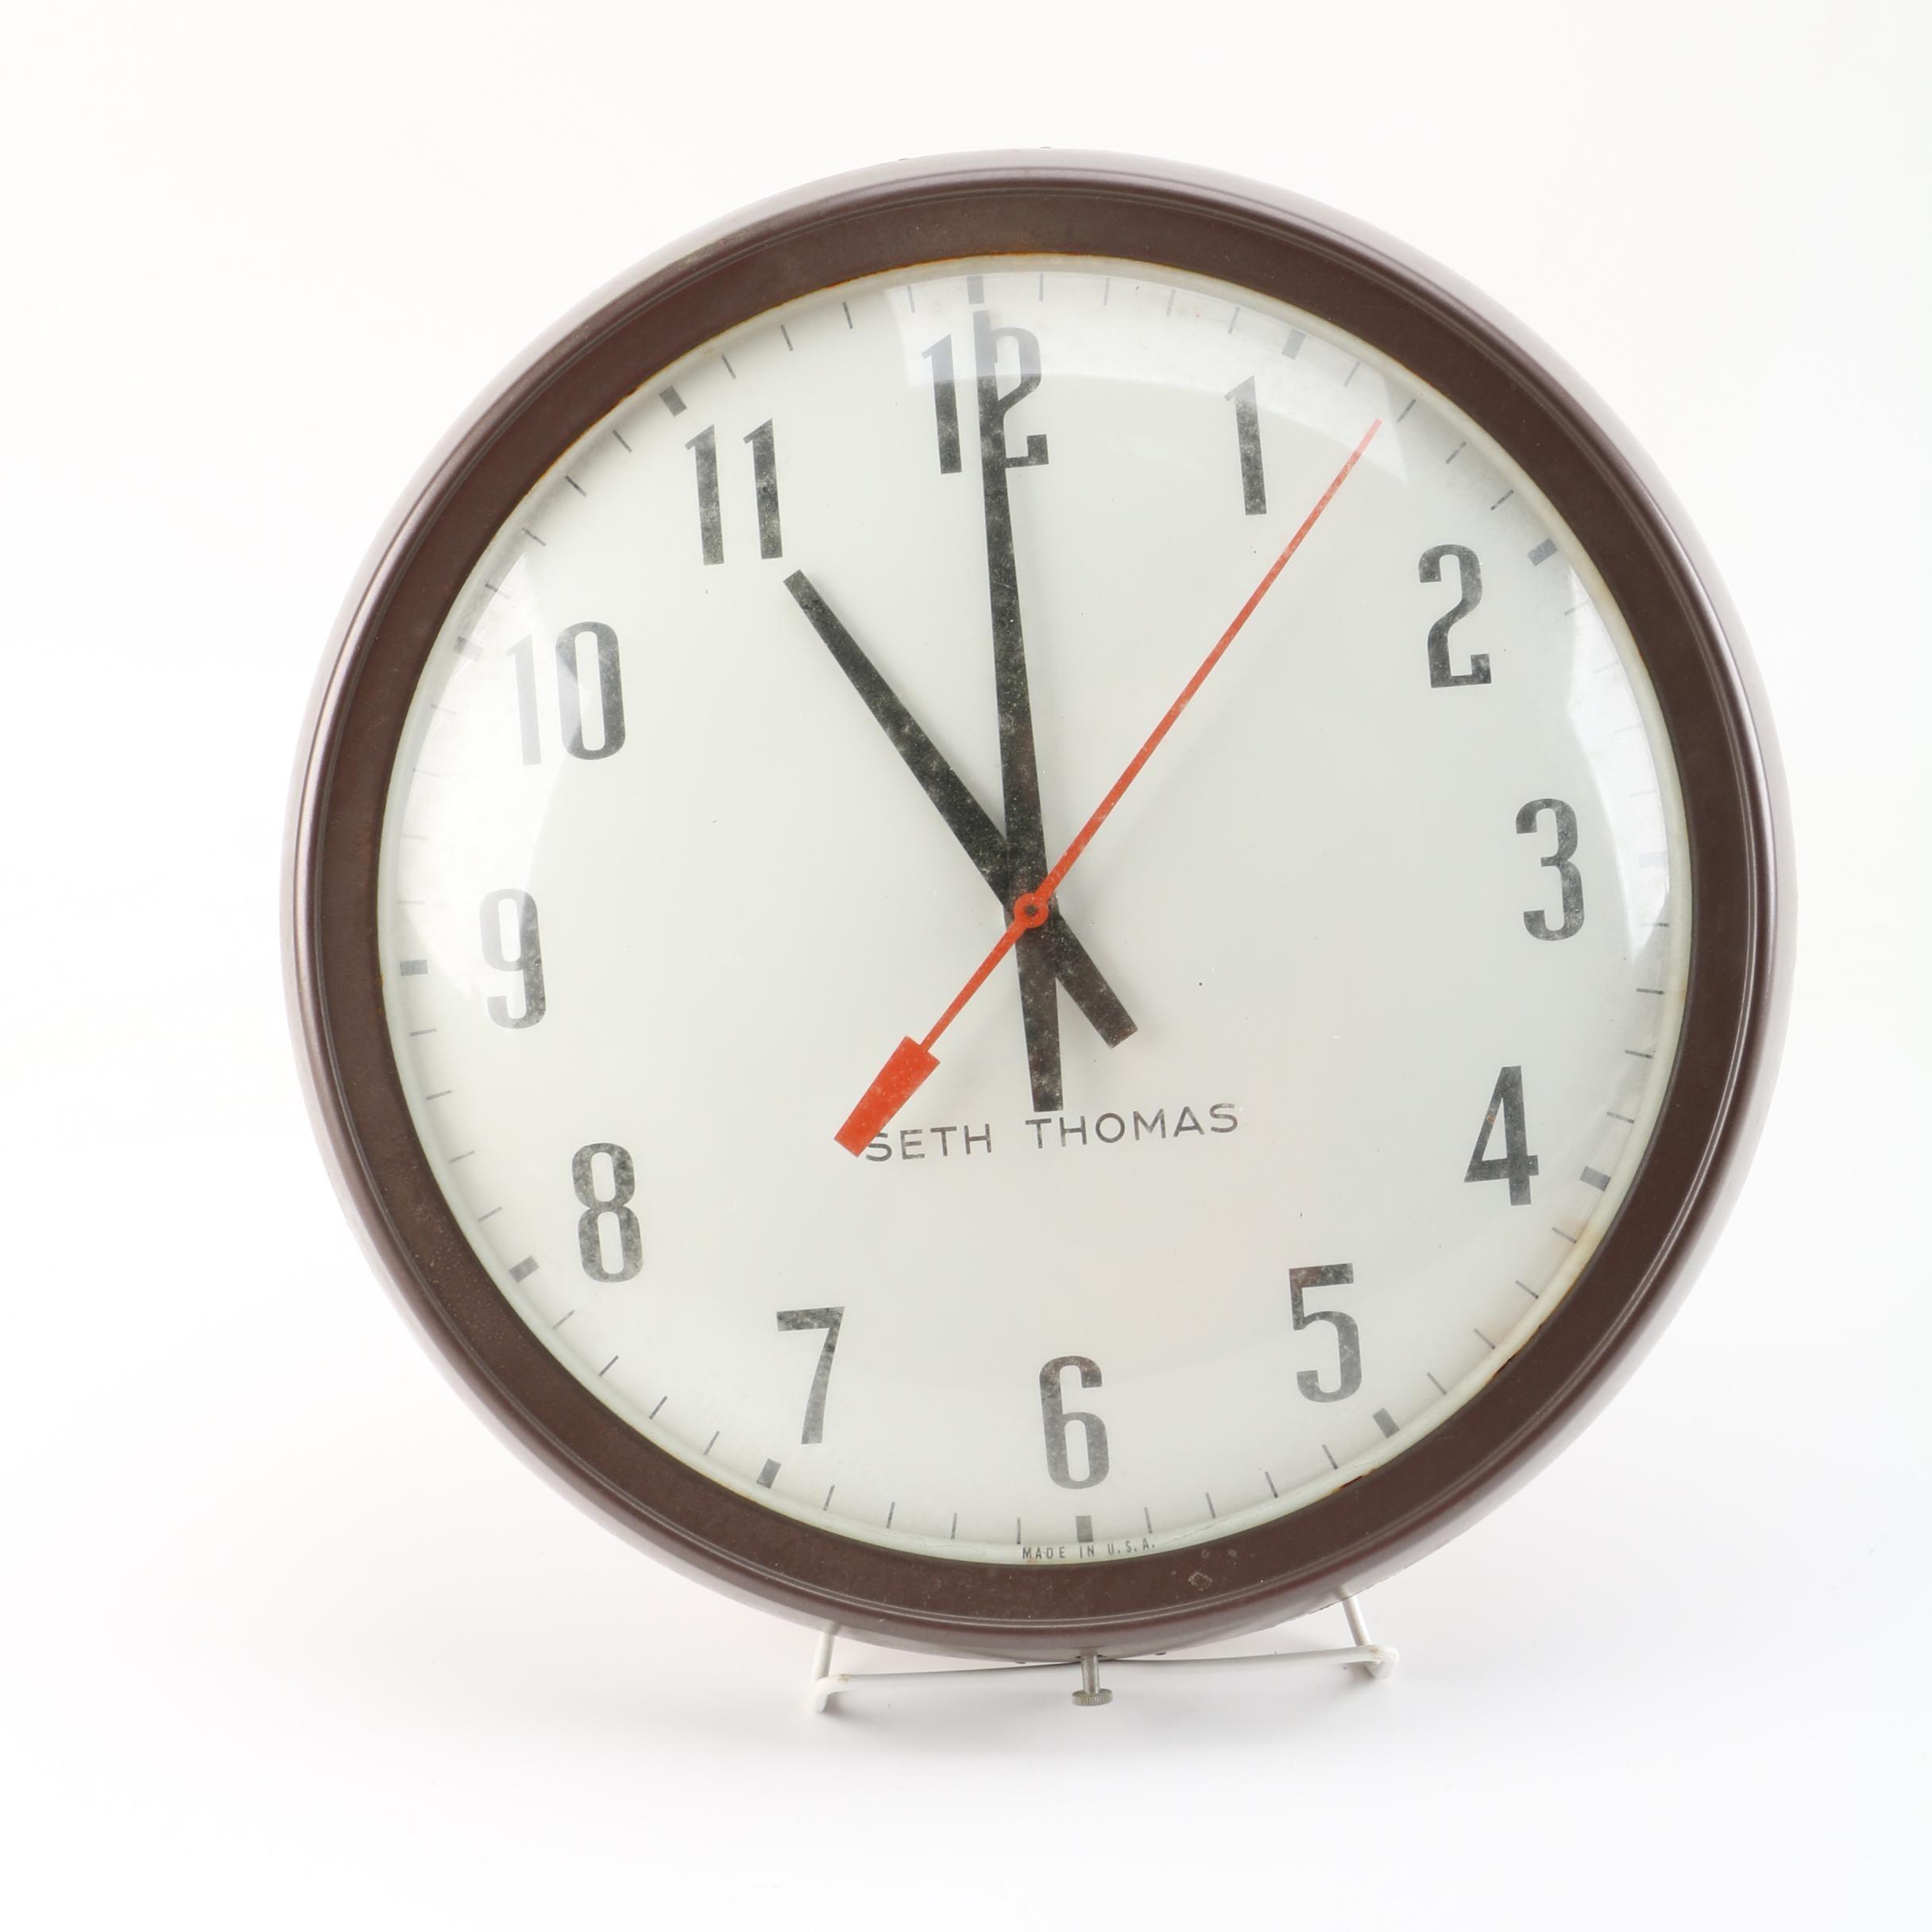 Seth Thomas Electric Wall Clock